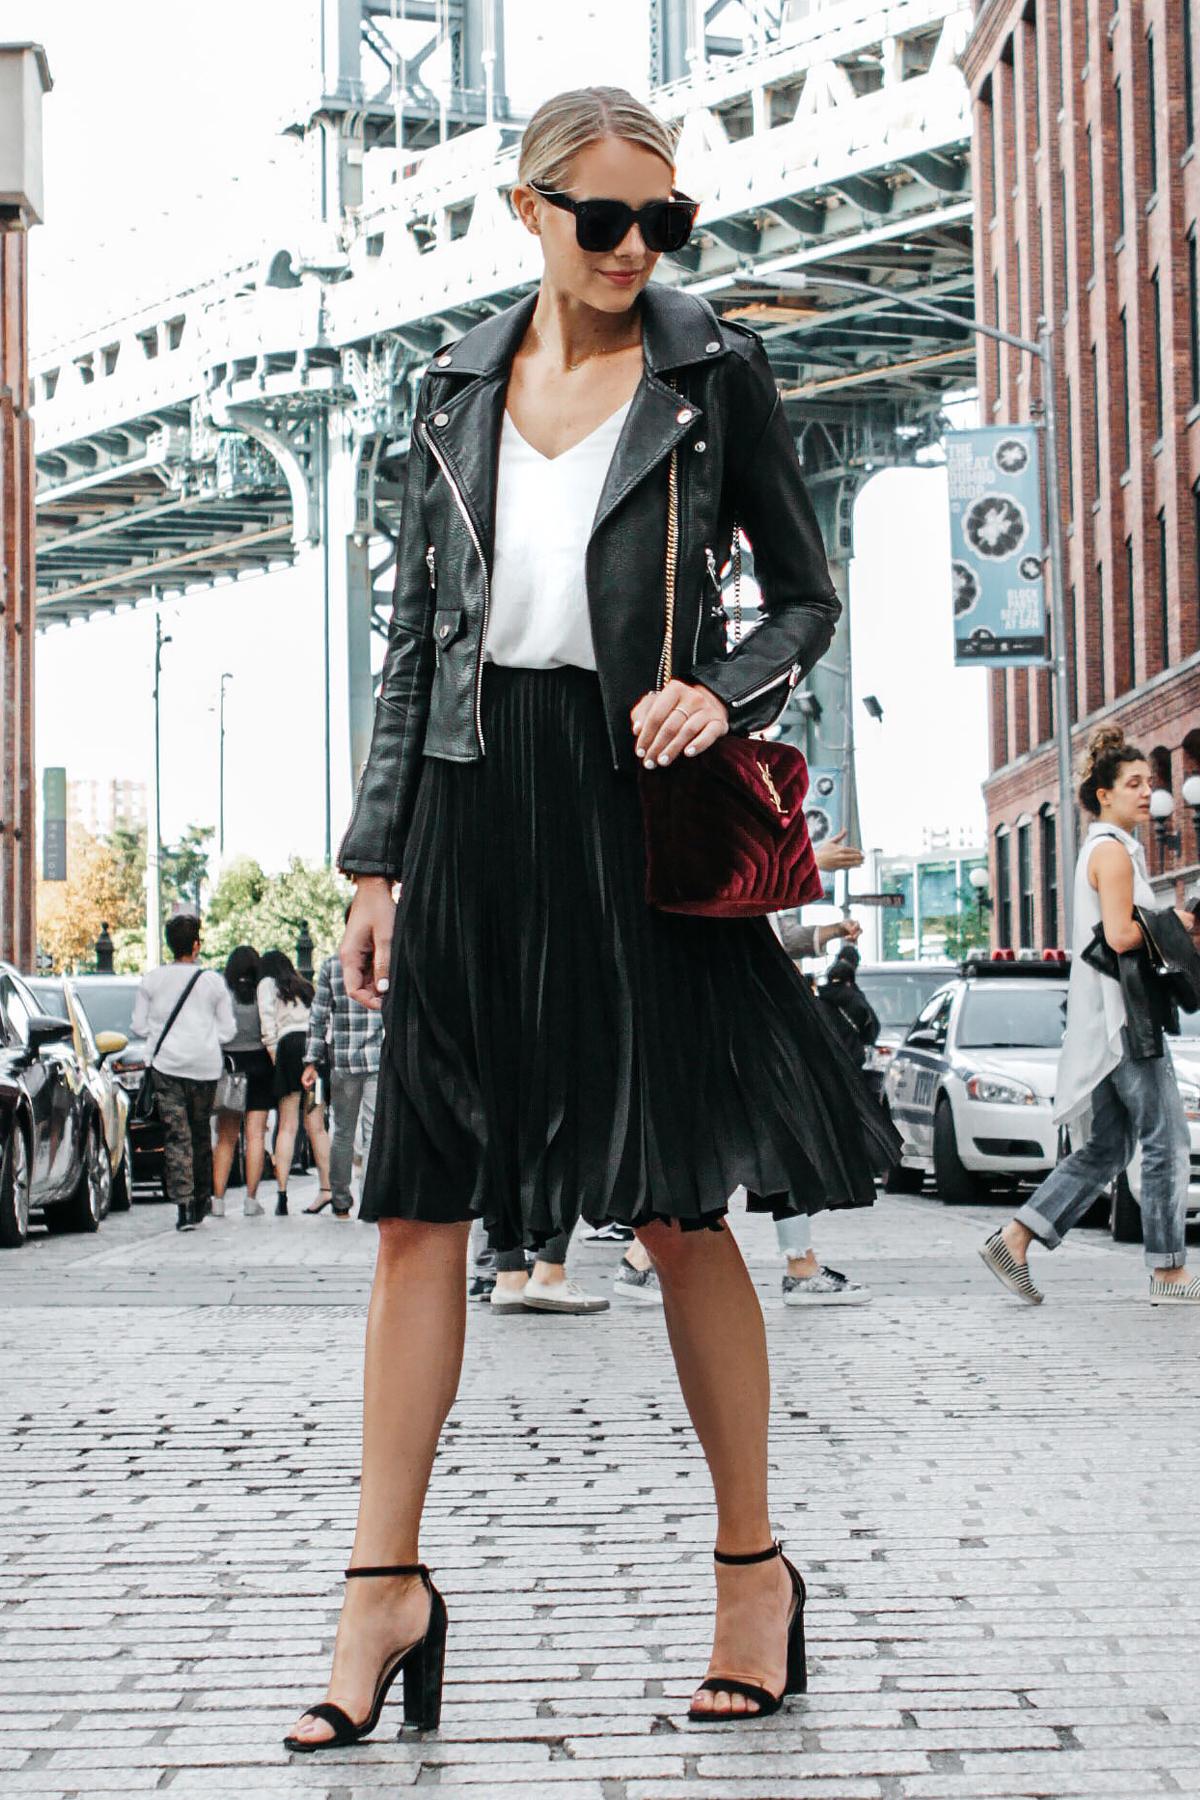 Blonde Woman Wearing Black Leather Jacket Black Pleated Midi Skirt Saint Laurent Burgundy Velvet Bag Black Ankle Strap Heeled Sandals Fashion Jackson Dallas Blogger Fashion Blogger Street Style NYFW Dumbo Bridge